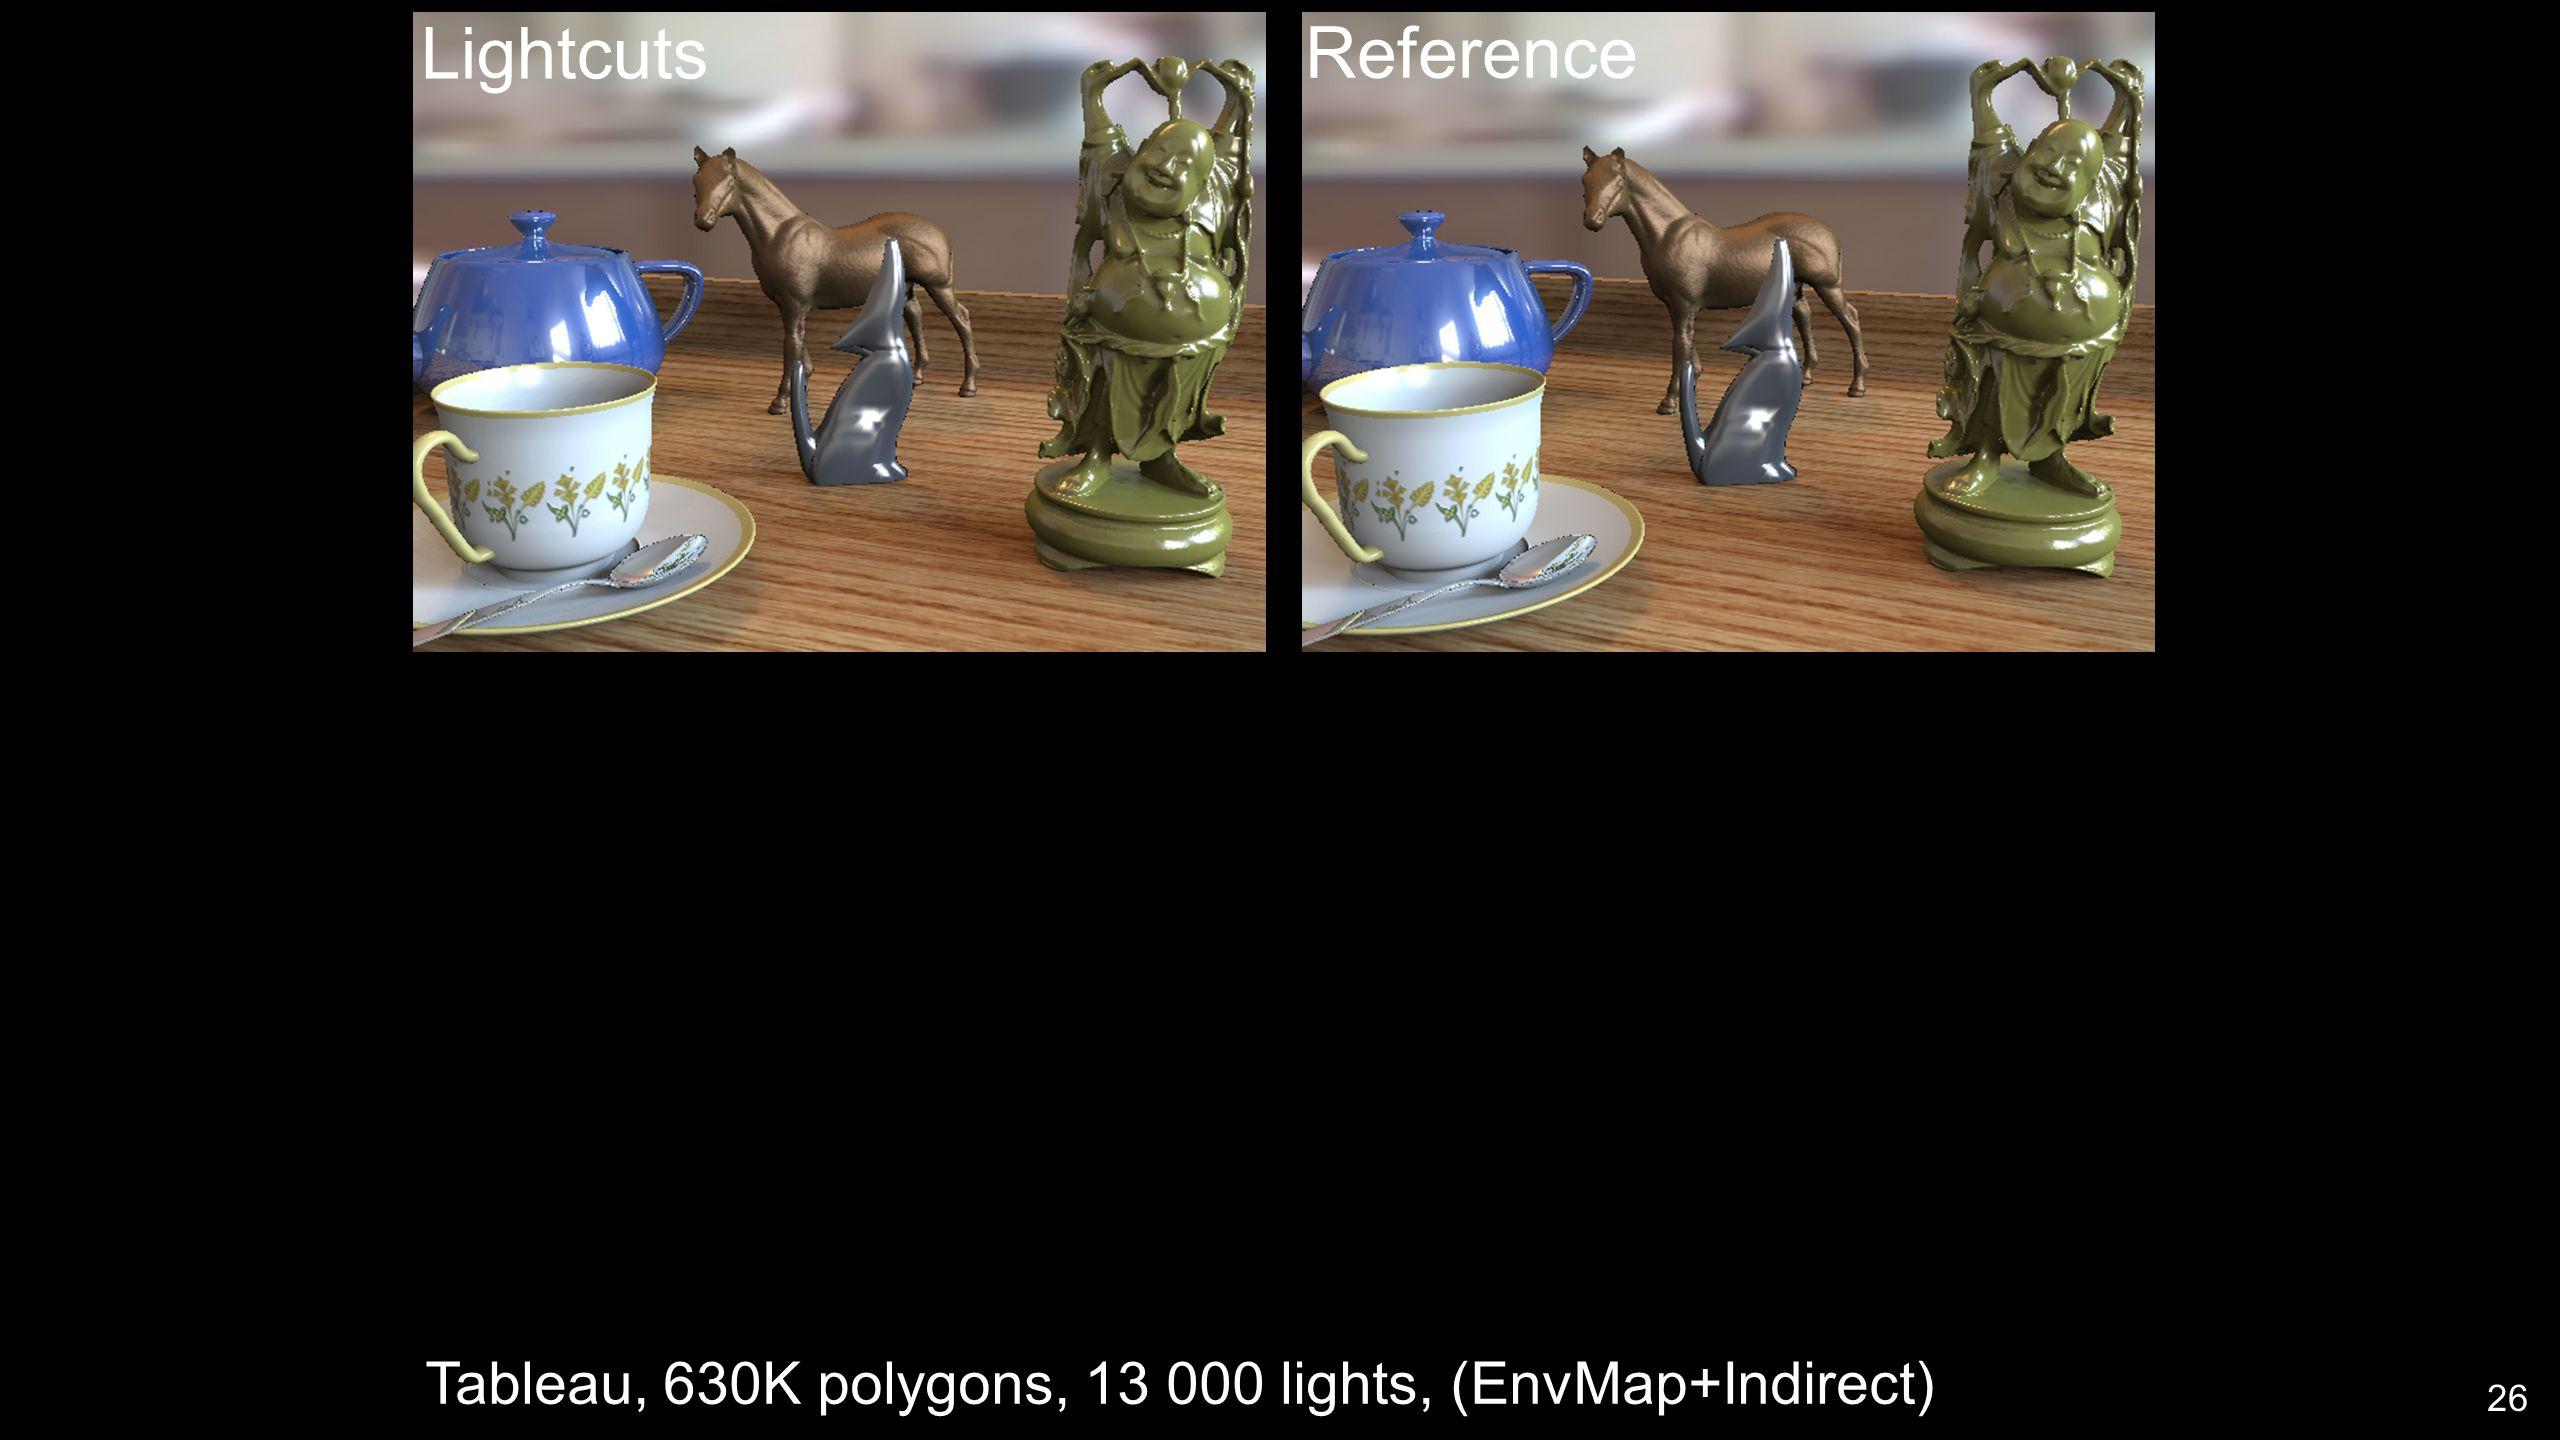 26 Lightcuts Reference Tableau, 630K polygons, 13 000 lights, (EnvMap+Indirect)